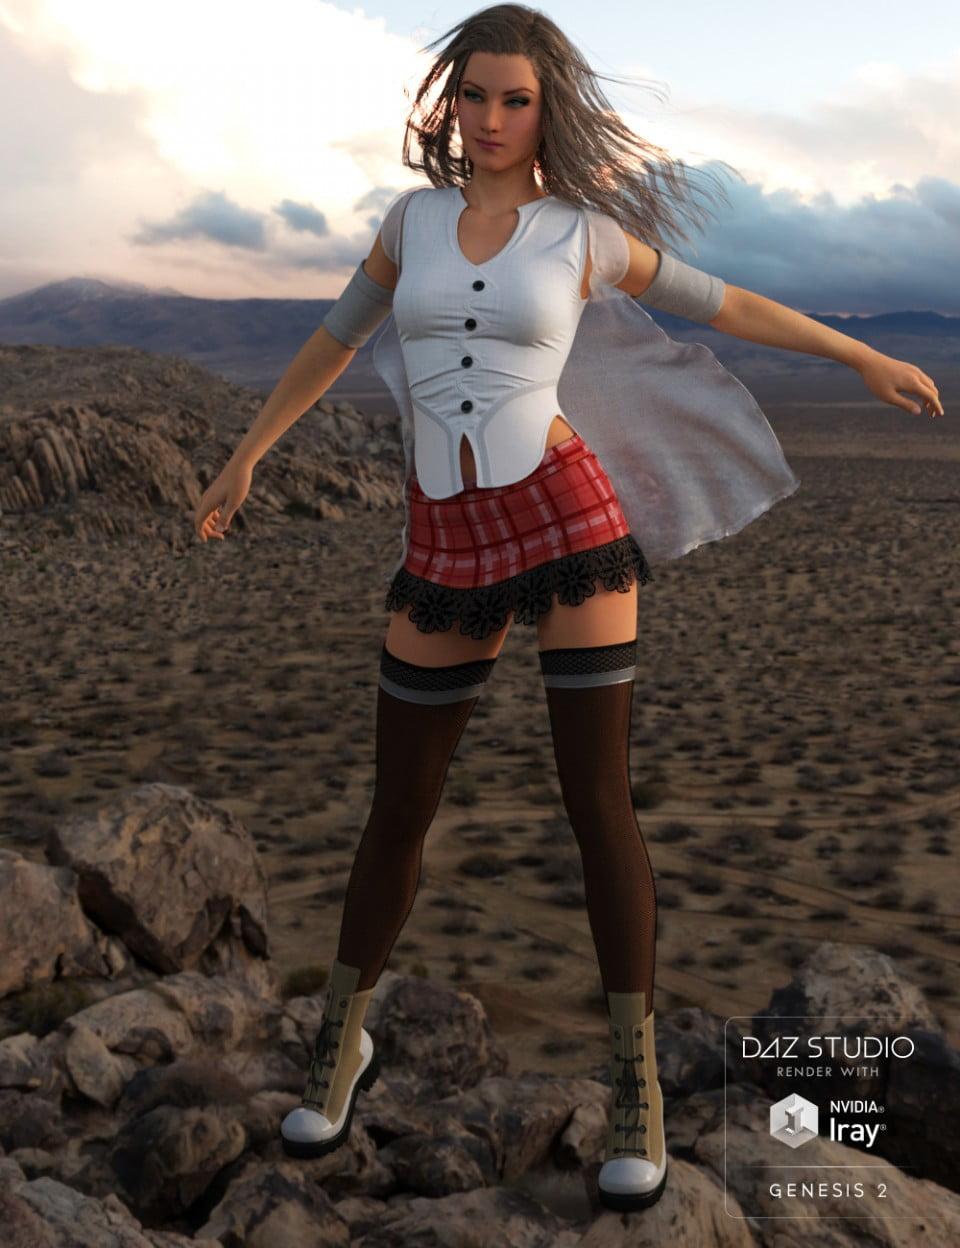 Unsung Heroine for Genesis 3 Female(s) and Genesis 2 Female(s)